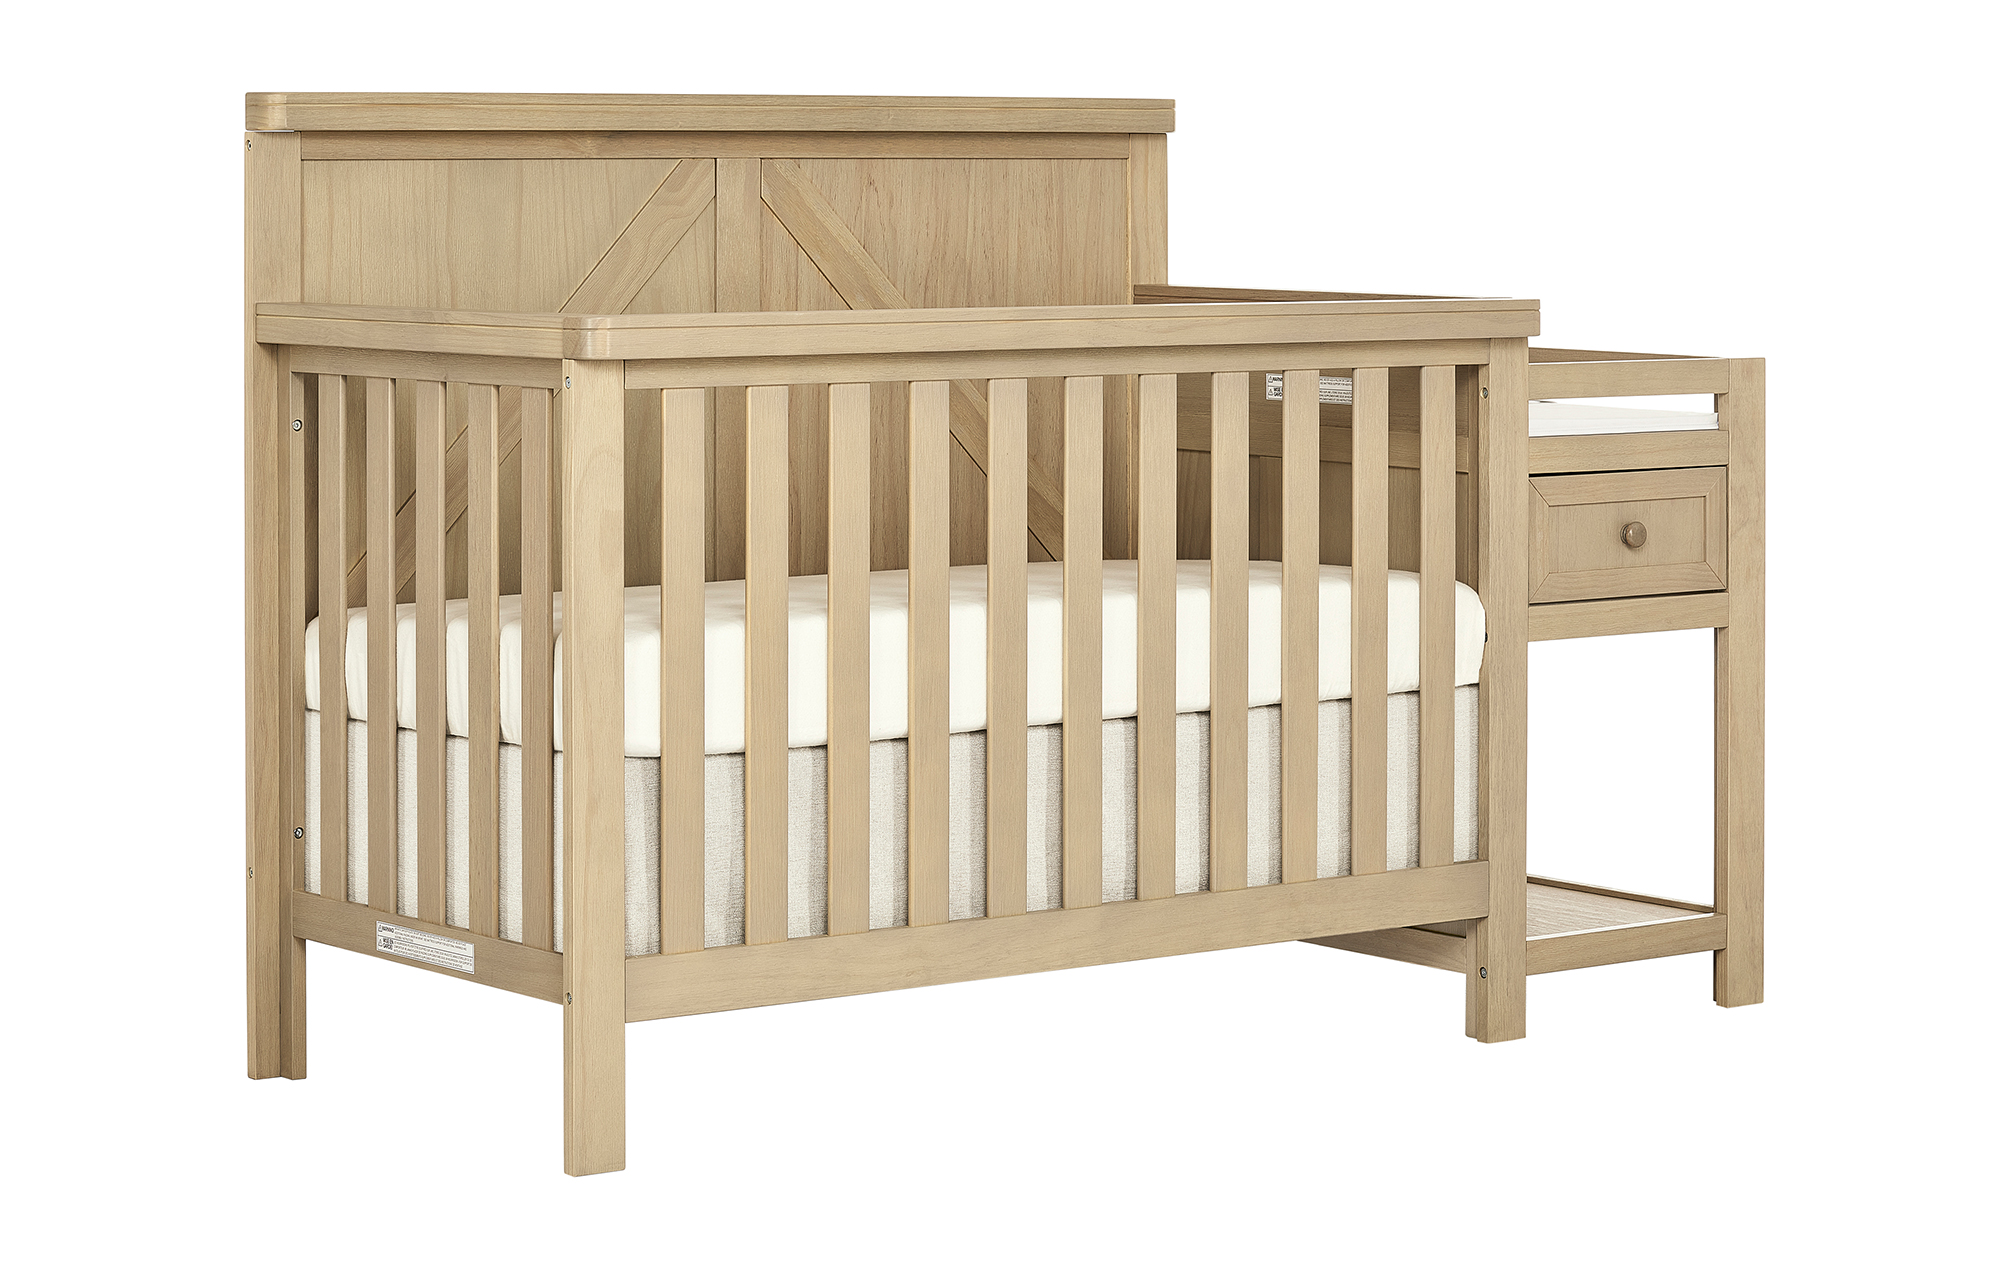 773-SC Meadowland Crib